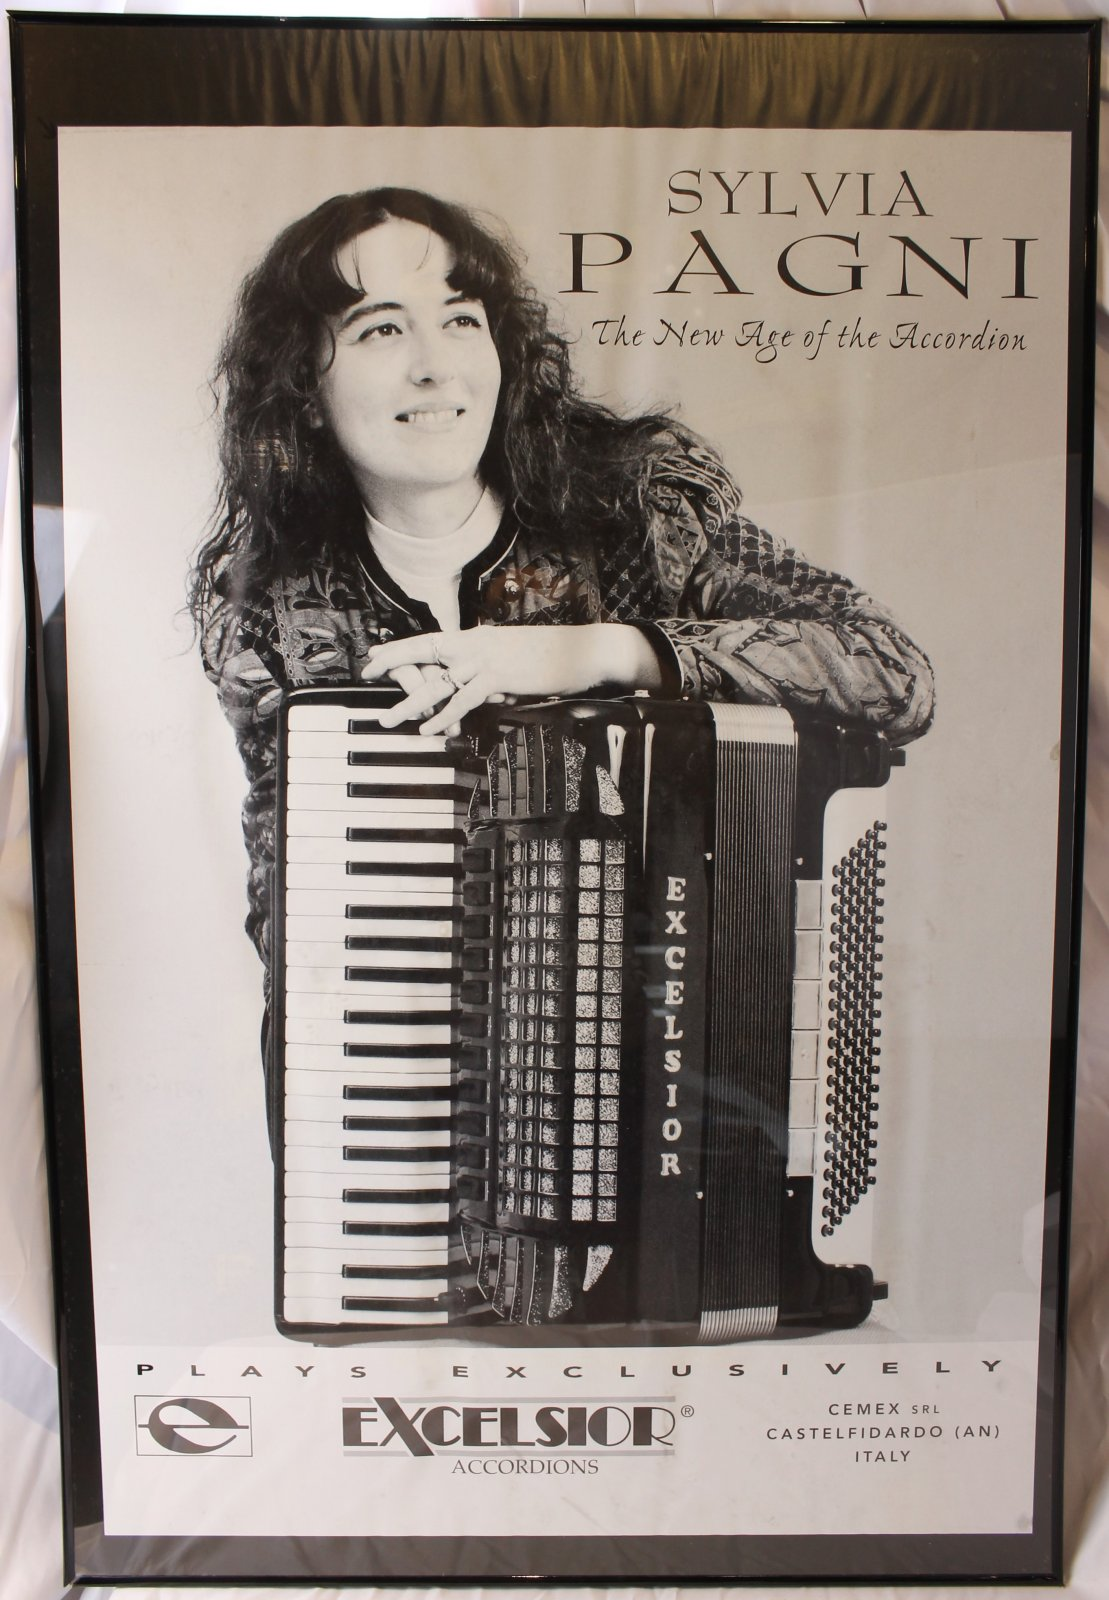 41 x 27 Framed Poster - Sylvia Pagni, Excelsior